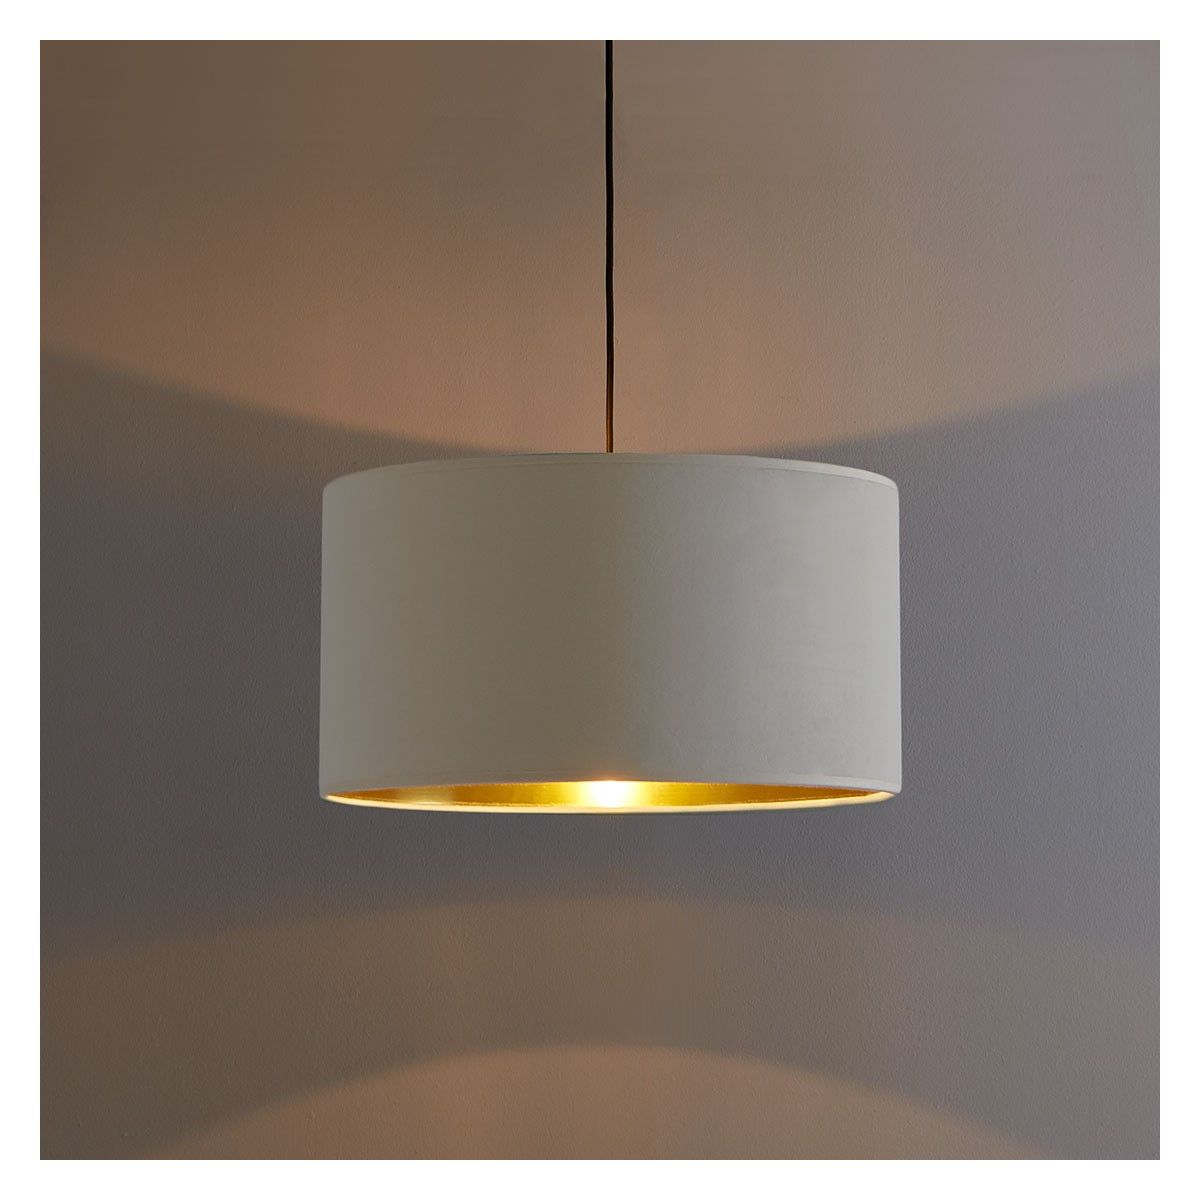 Tambor Cream Velvet Gold Lined Lampshade Dia 49cm In 2020 Ceiling Shades Gold Line Modern Contemporary Design